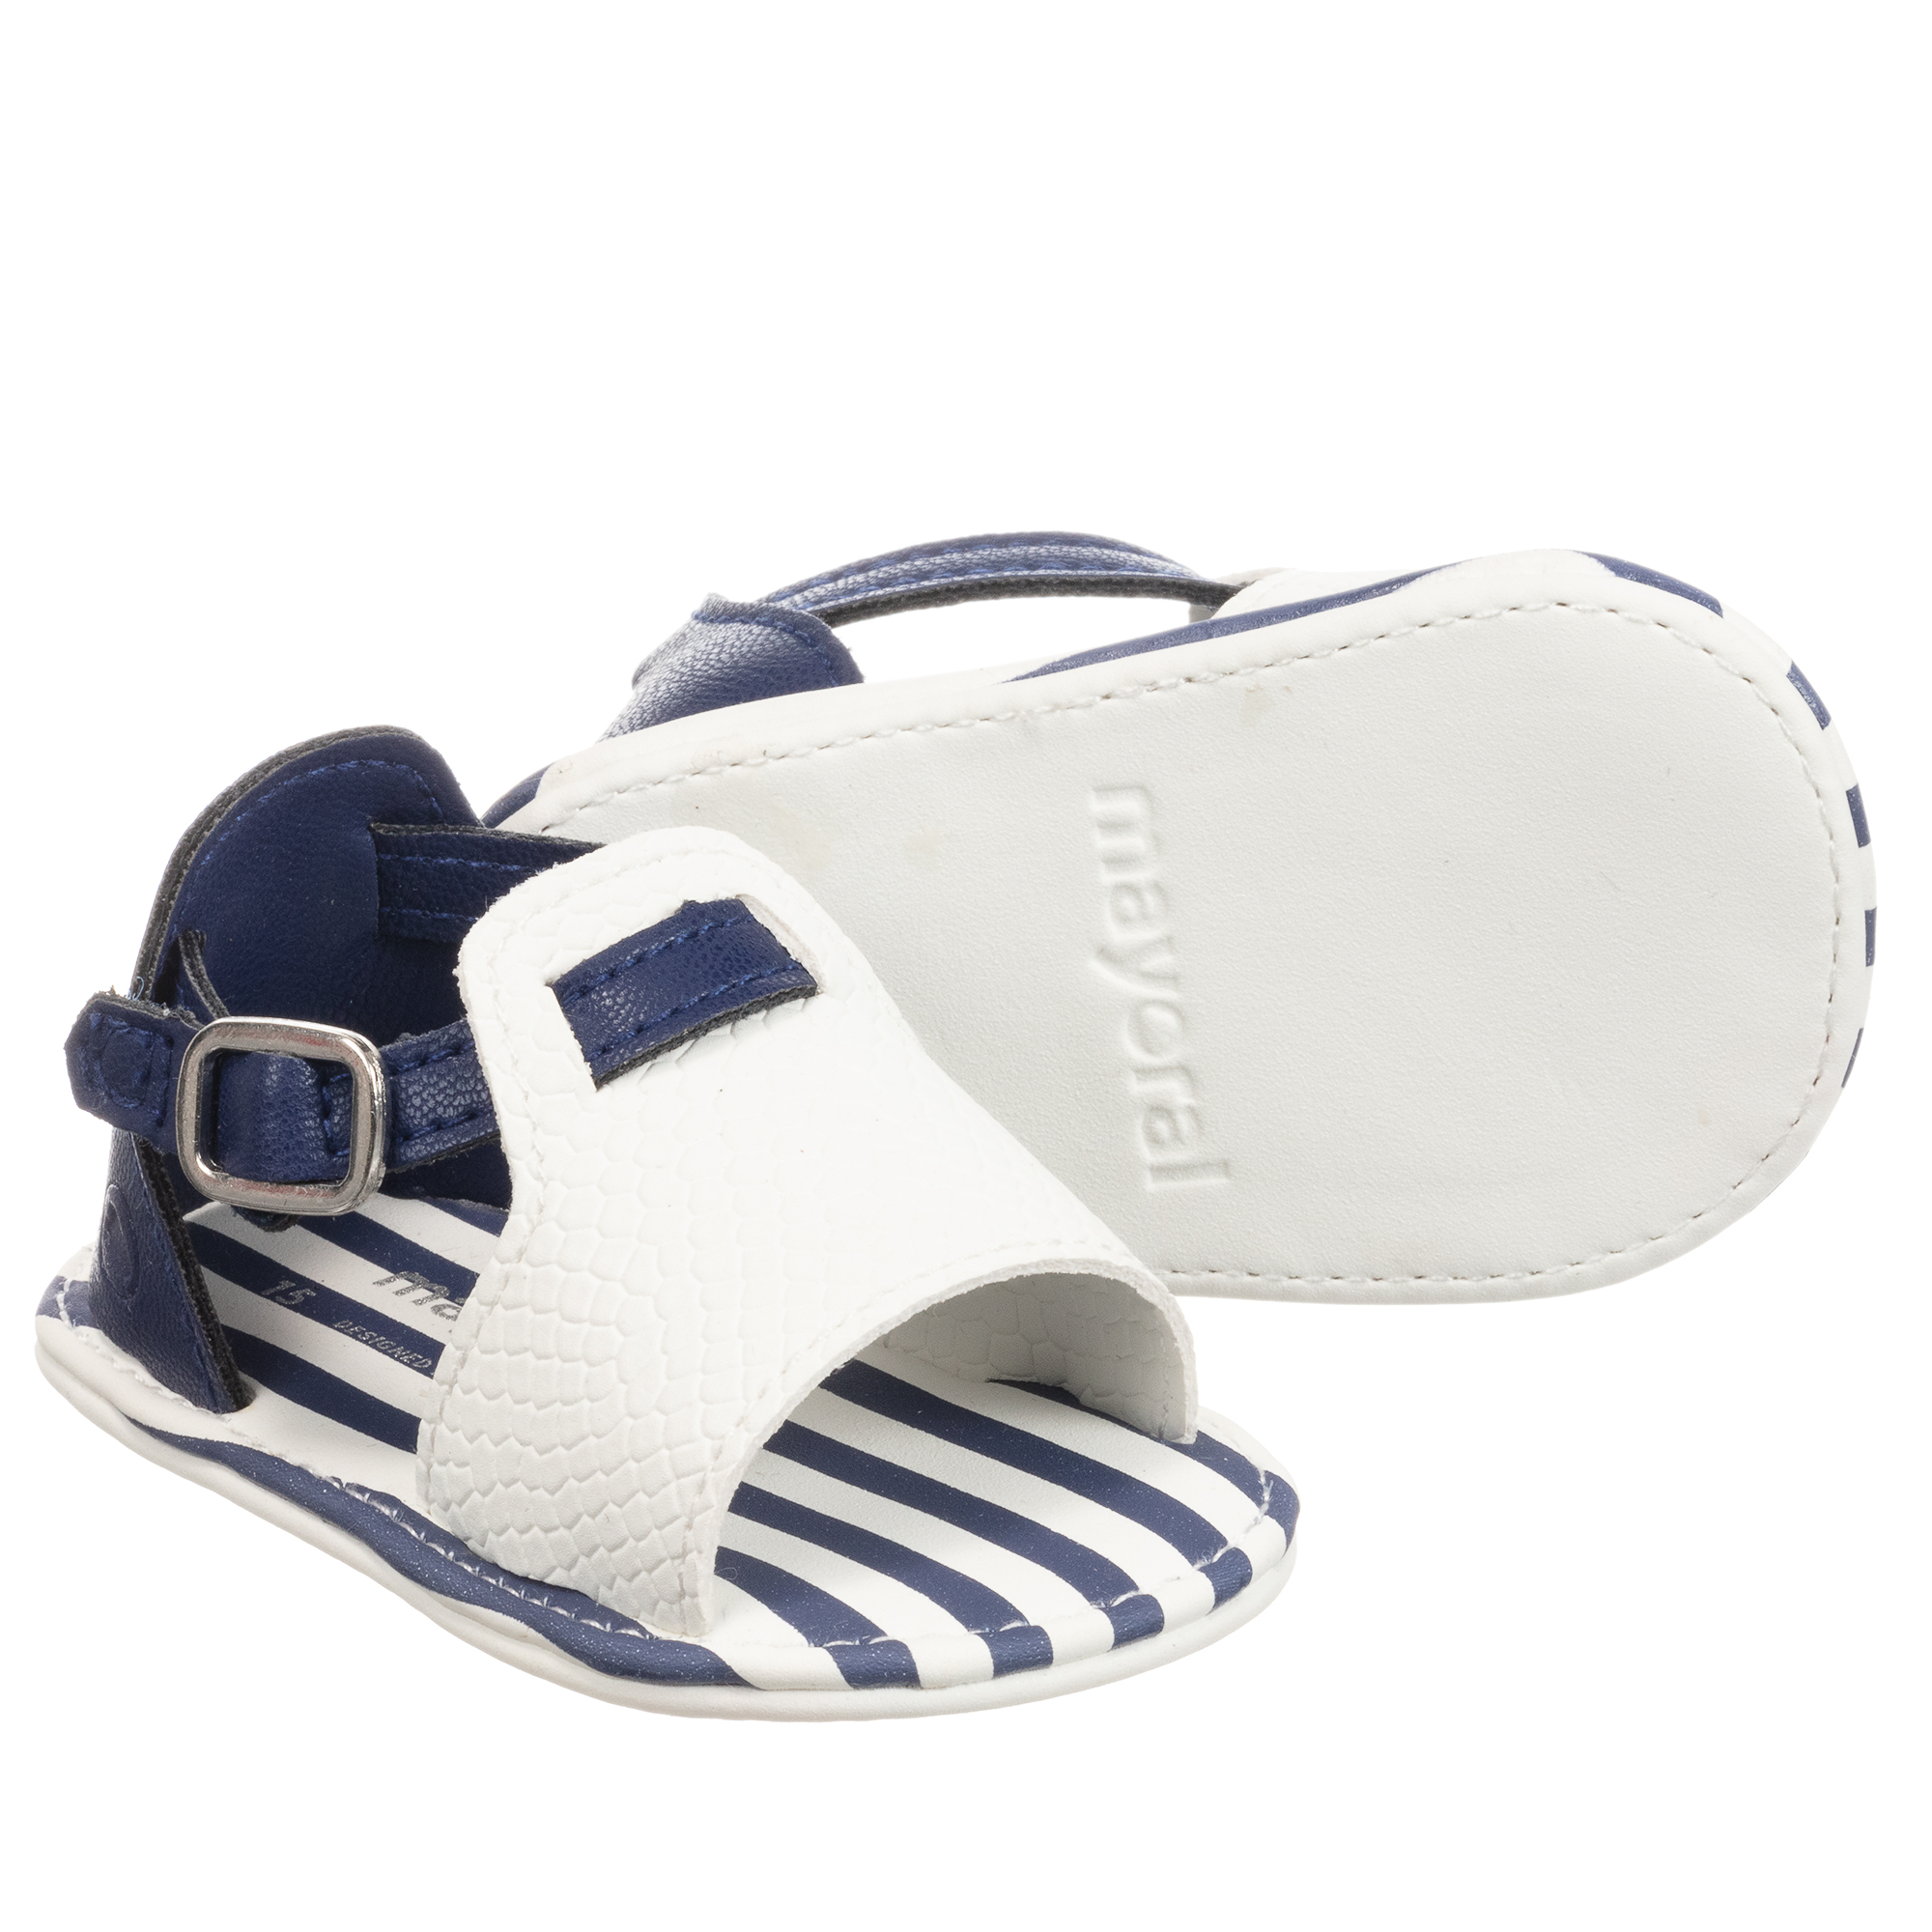 Baby Sandals   Childrensalon Outlet